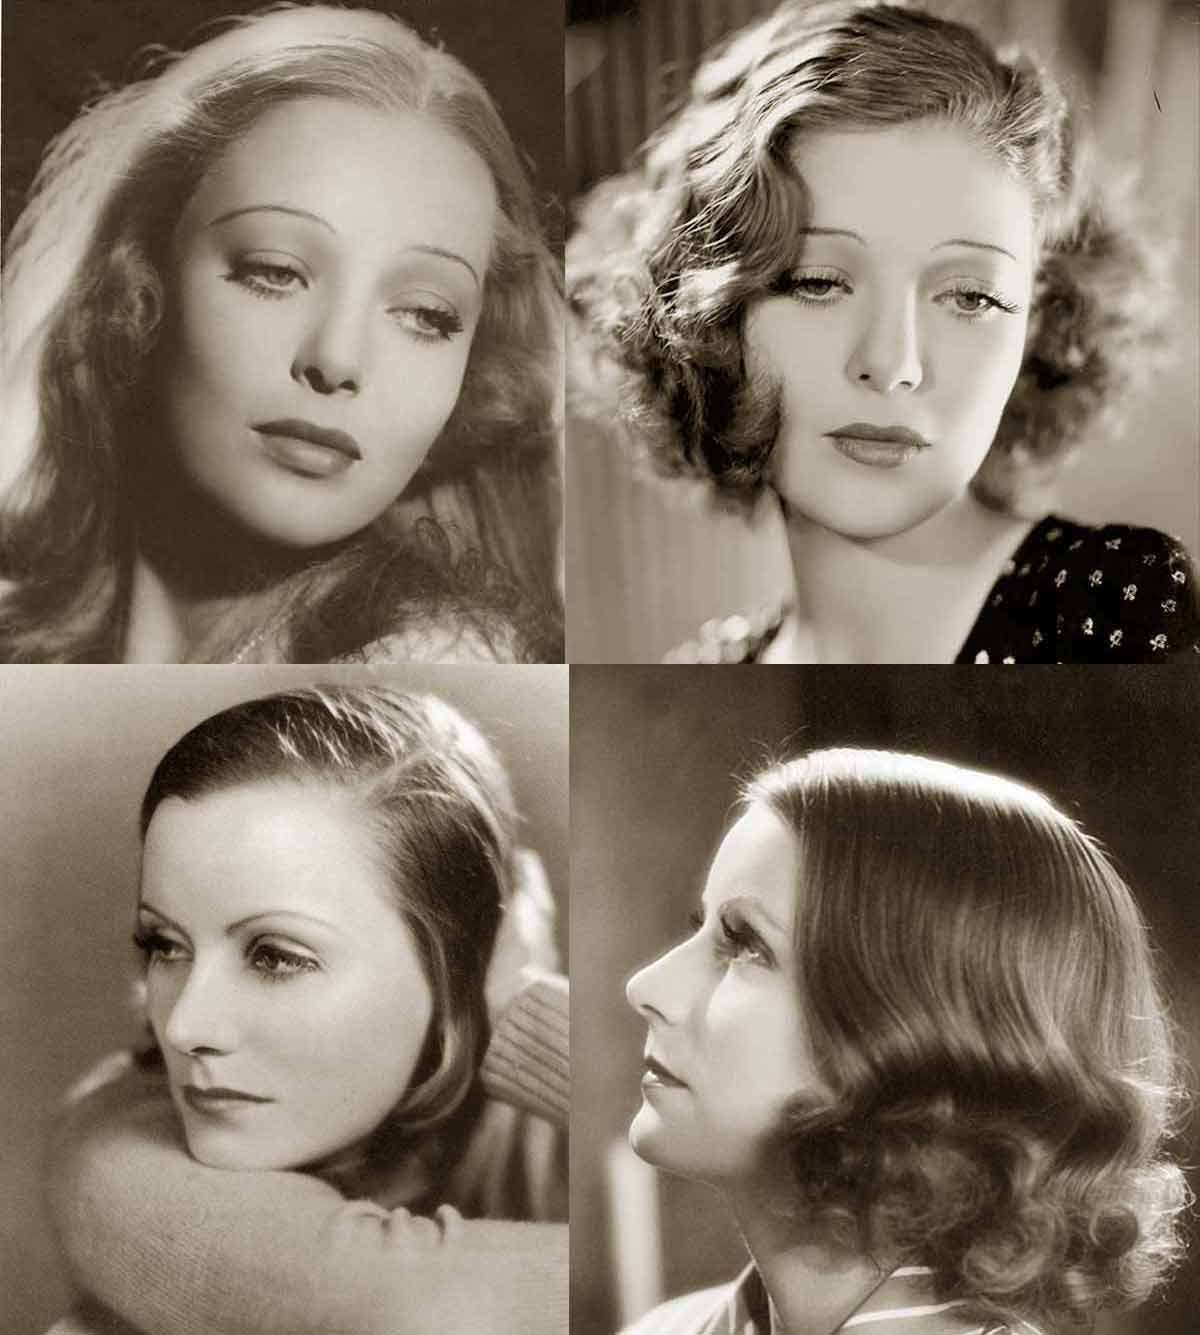 193039s Fashion Vintage Hair Salon 1934 Glamourdaze